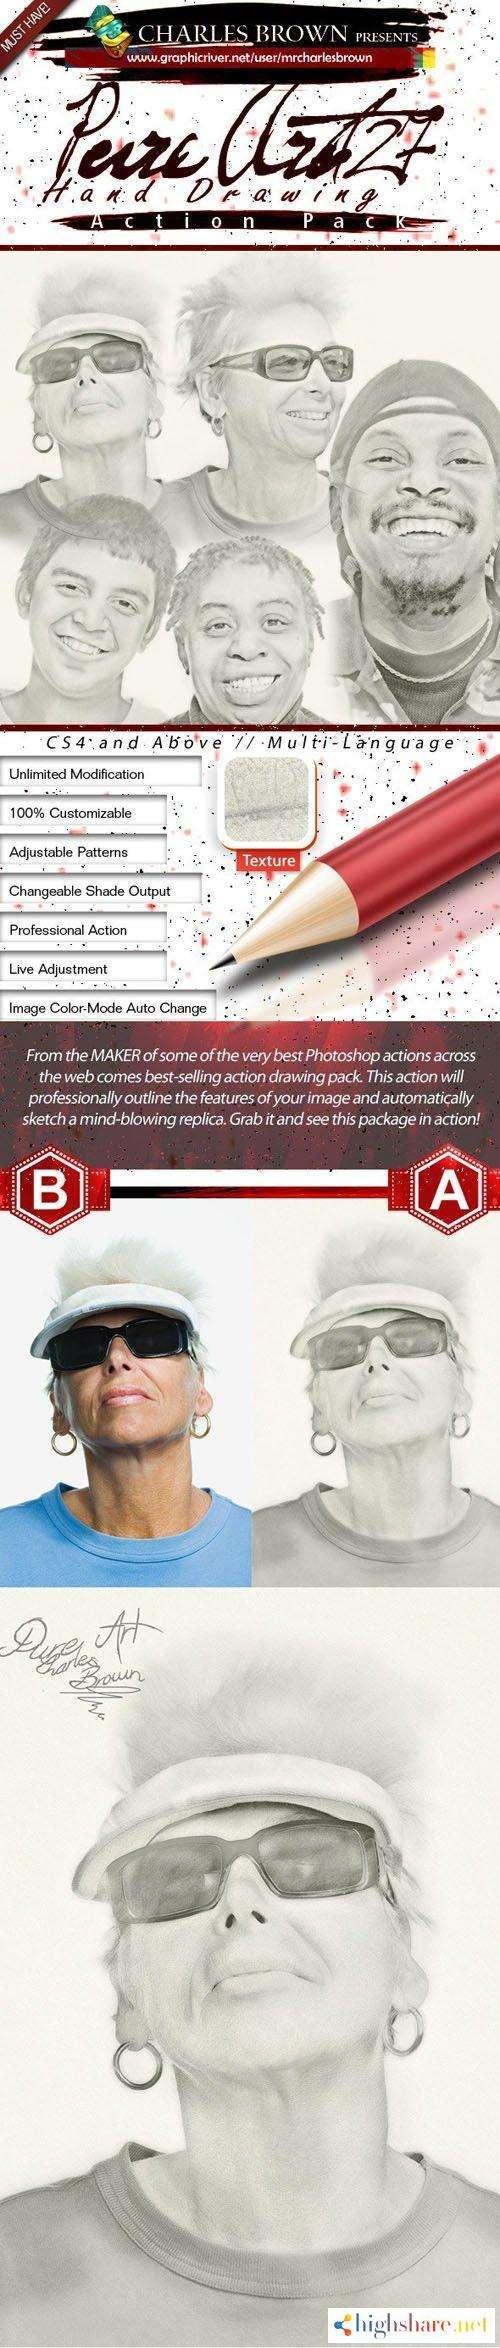 gr pure art hand drawing 127 golf pencil 5f4a0d9a31af1 - GR - Pure Art Hand Drawing 127 - Golf Pencil